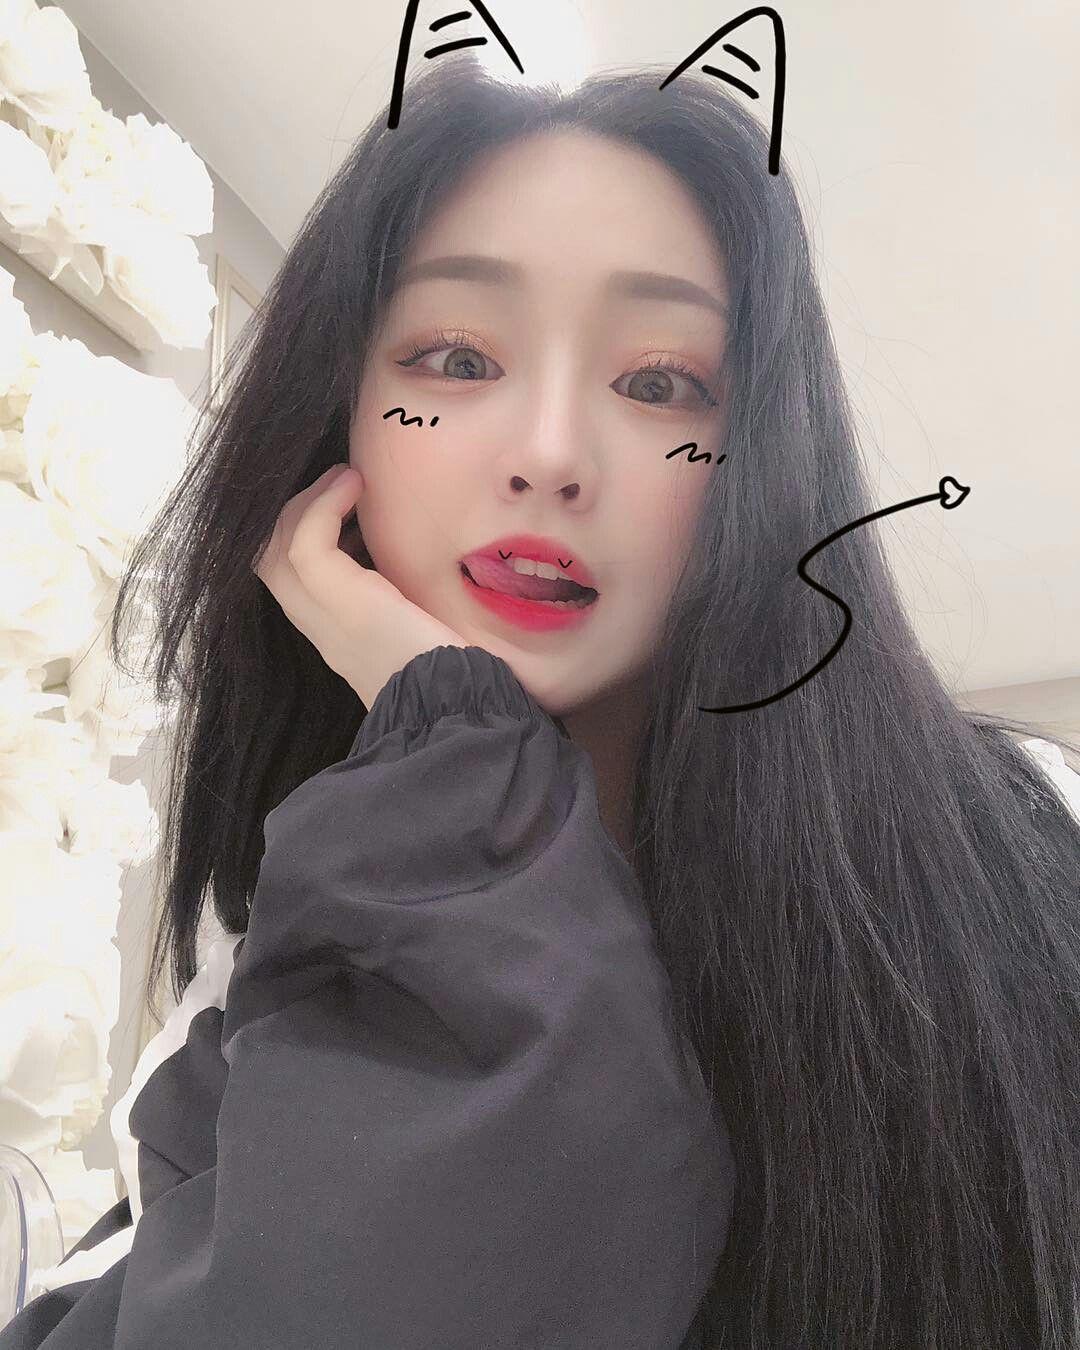 Pin by M🧸👼🏻 on ulzzangs | Cute korean girl, Ulzzang ...